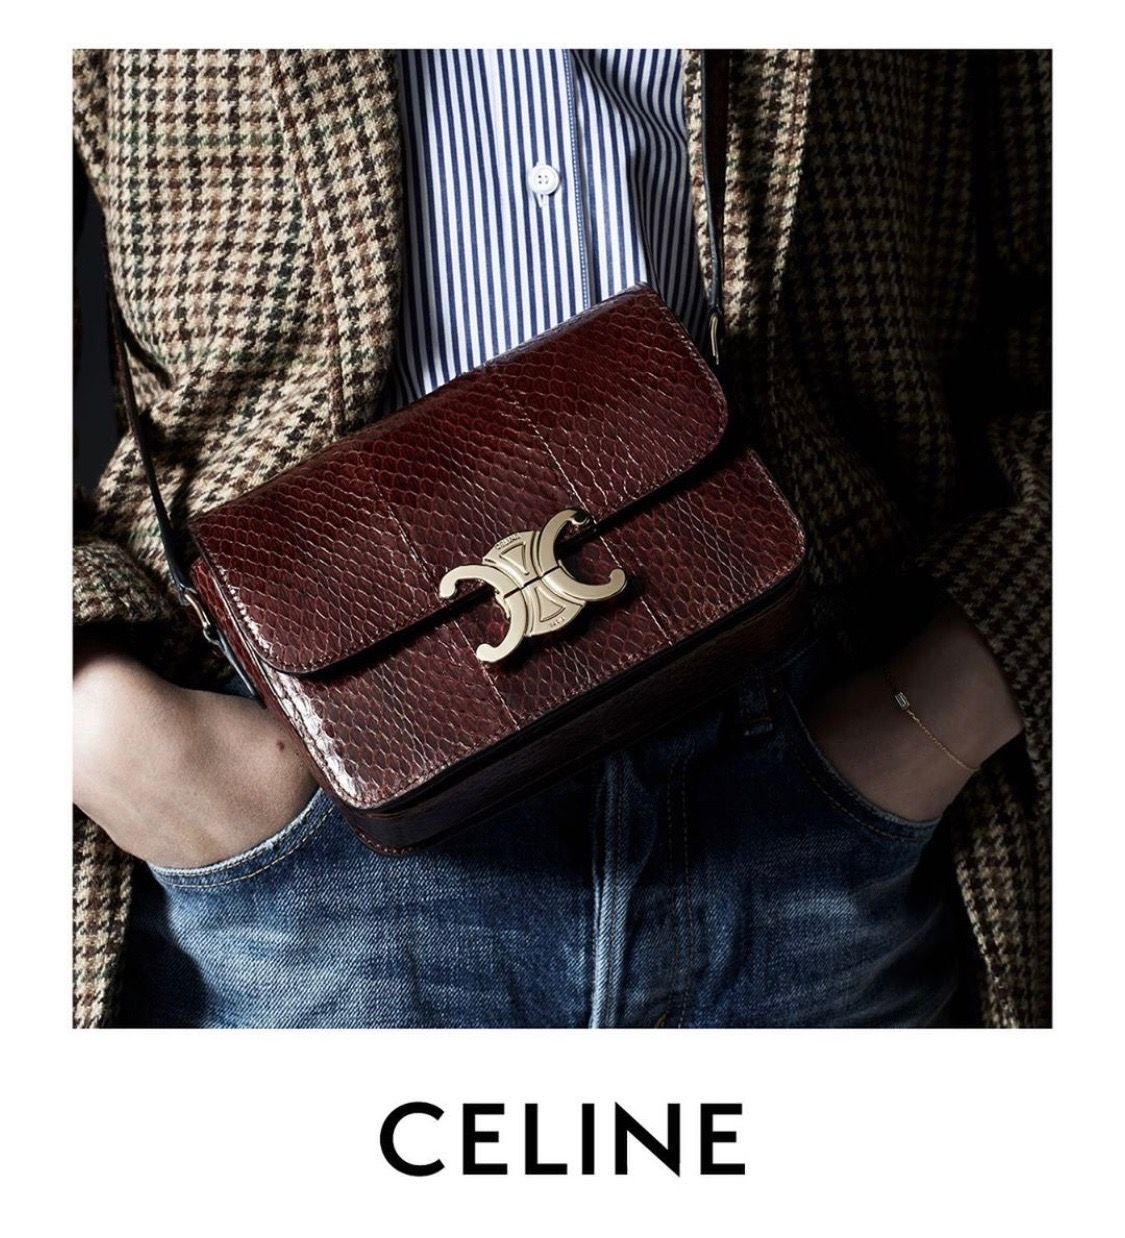 Image by Ashlee Sara Jones on CÉLINE CHIC Celine tote